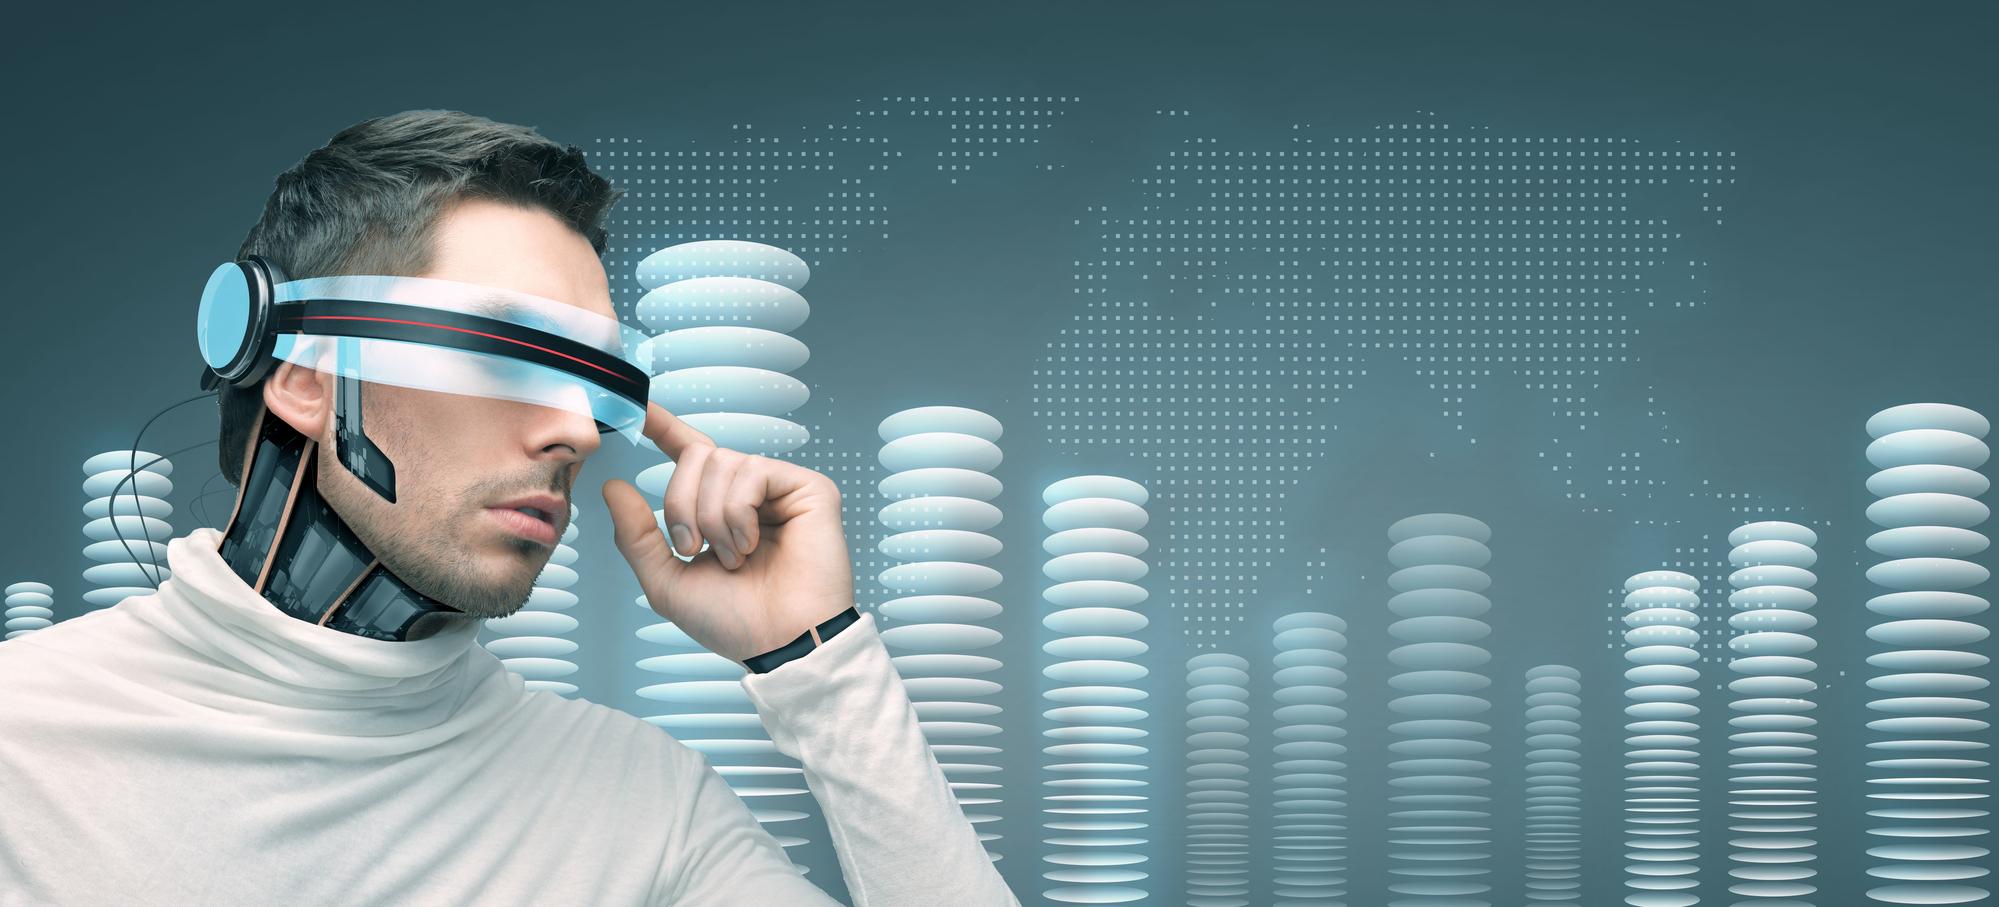 alepietrocola-virtualrealityjpg